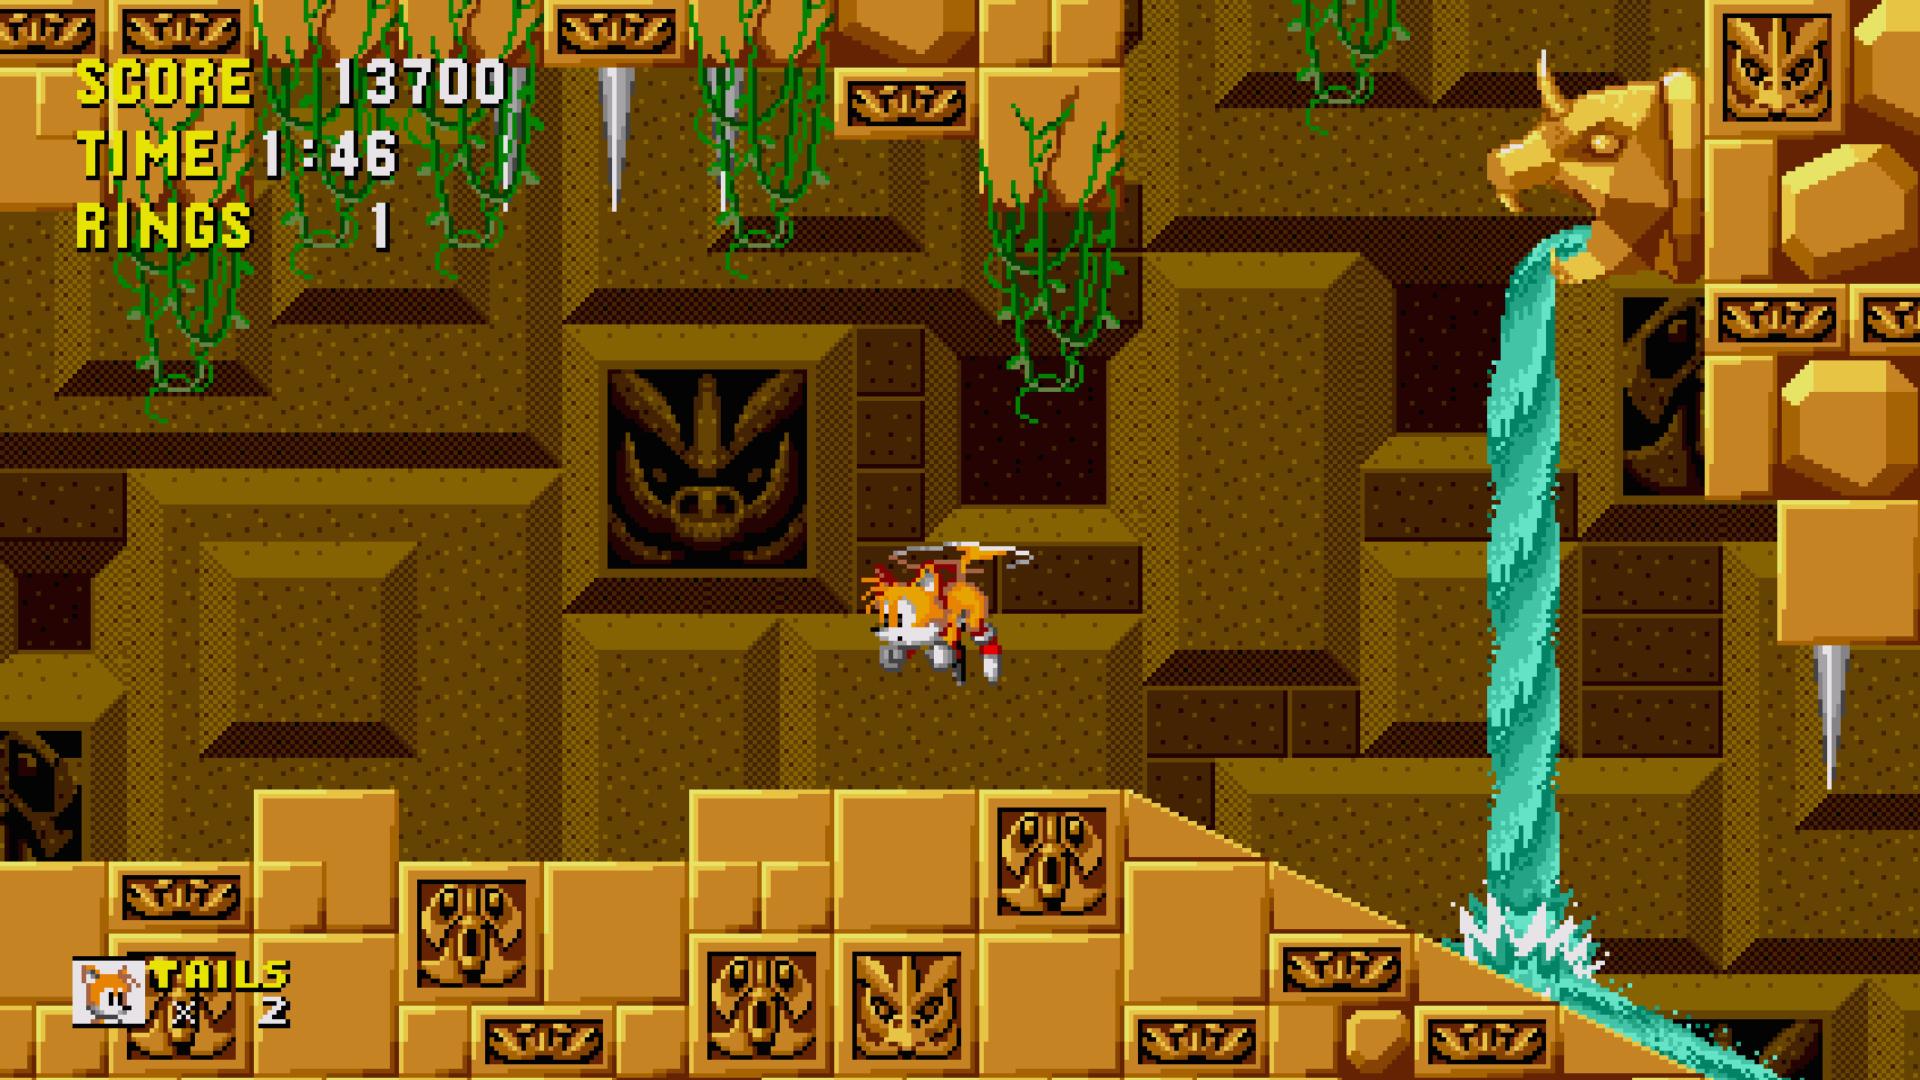 File:Sonic 1 2013 pic 4.jpg